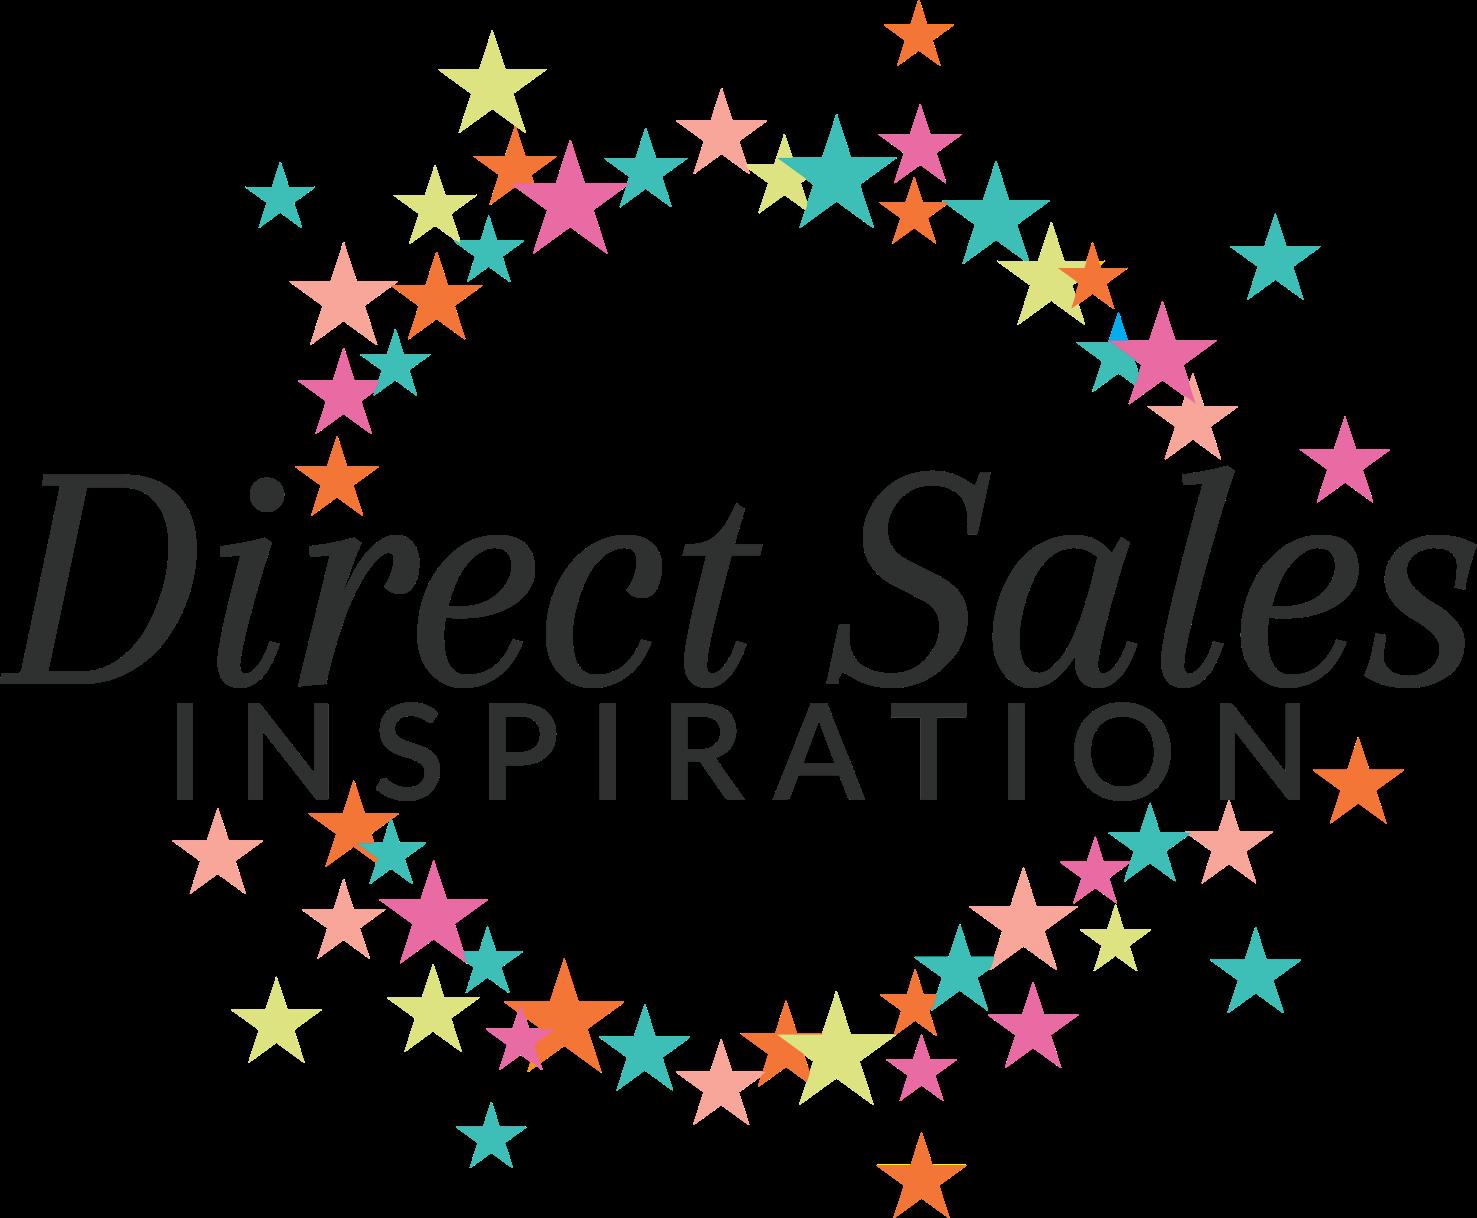 Direct Sales Inspiration